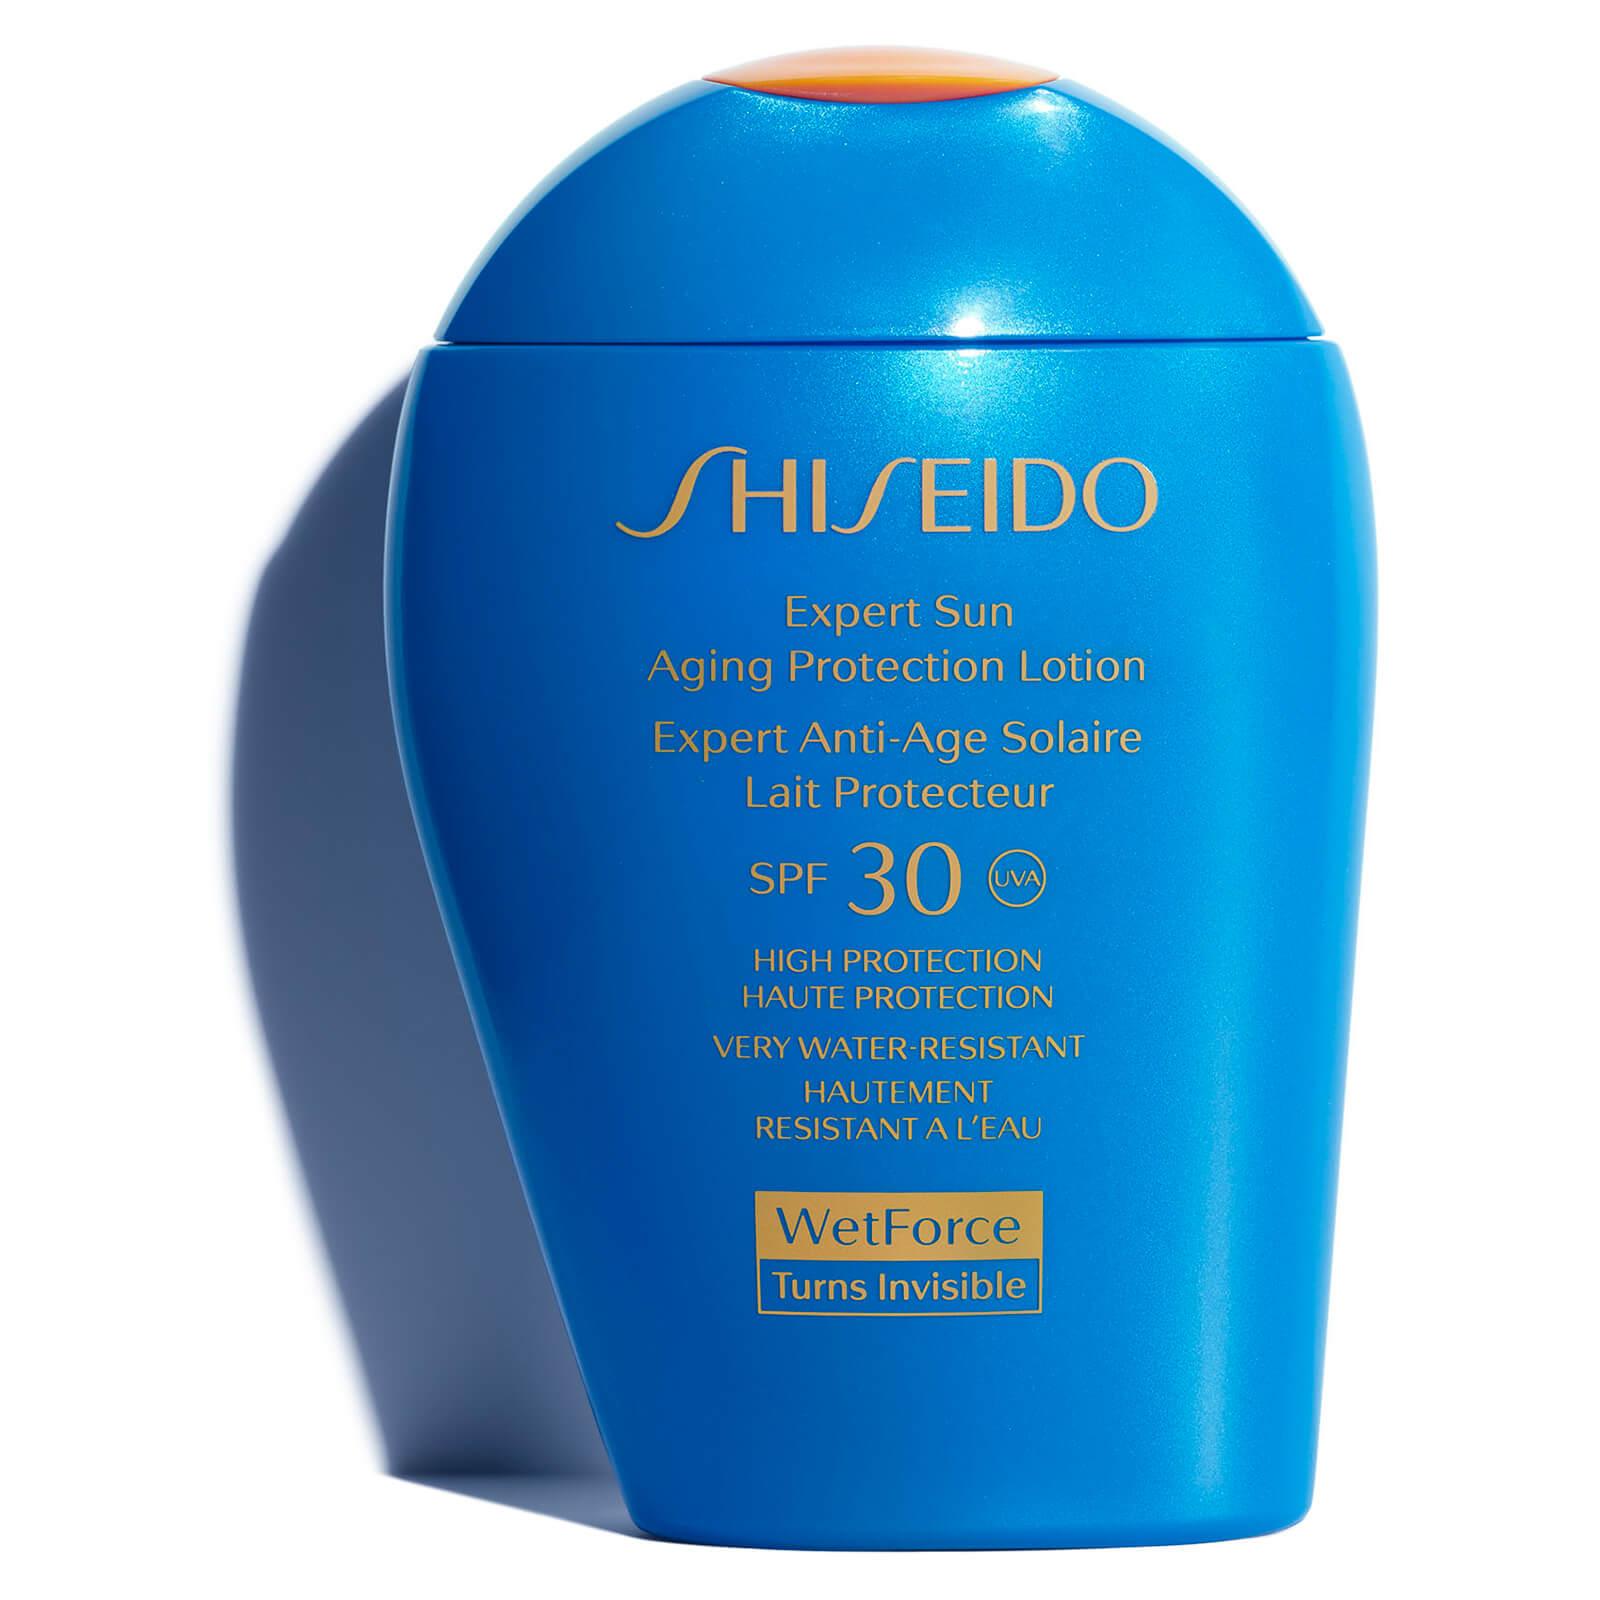 Shiseido Expert Sun Ageing Protection Lotion SPF30 100ml